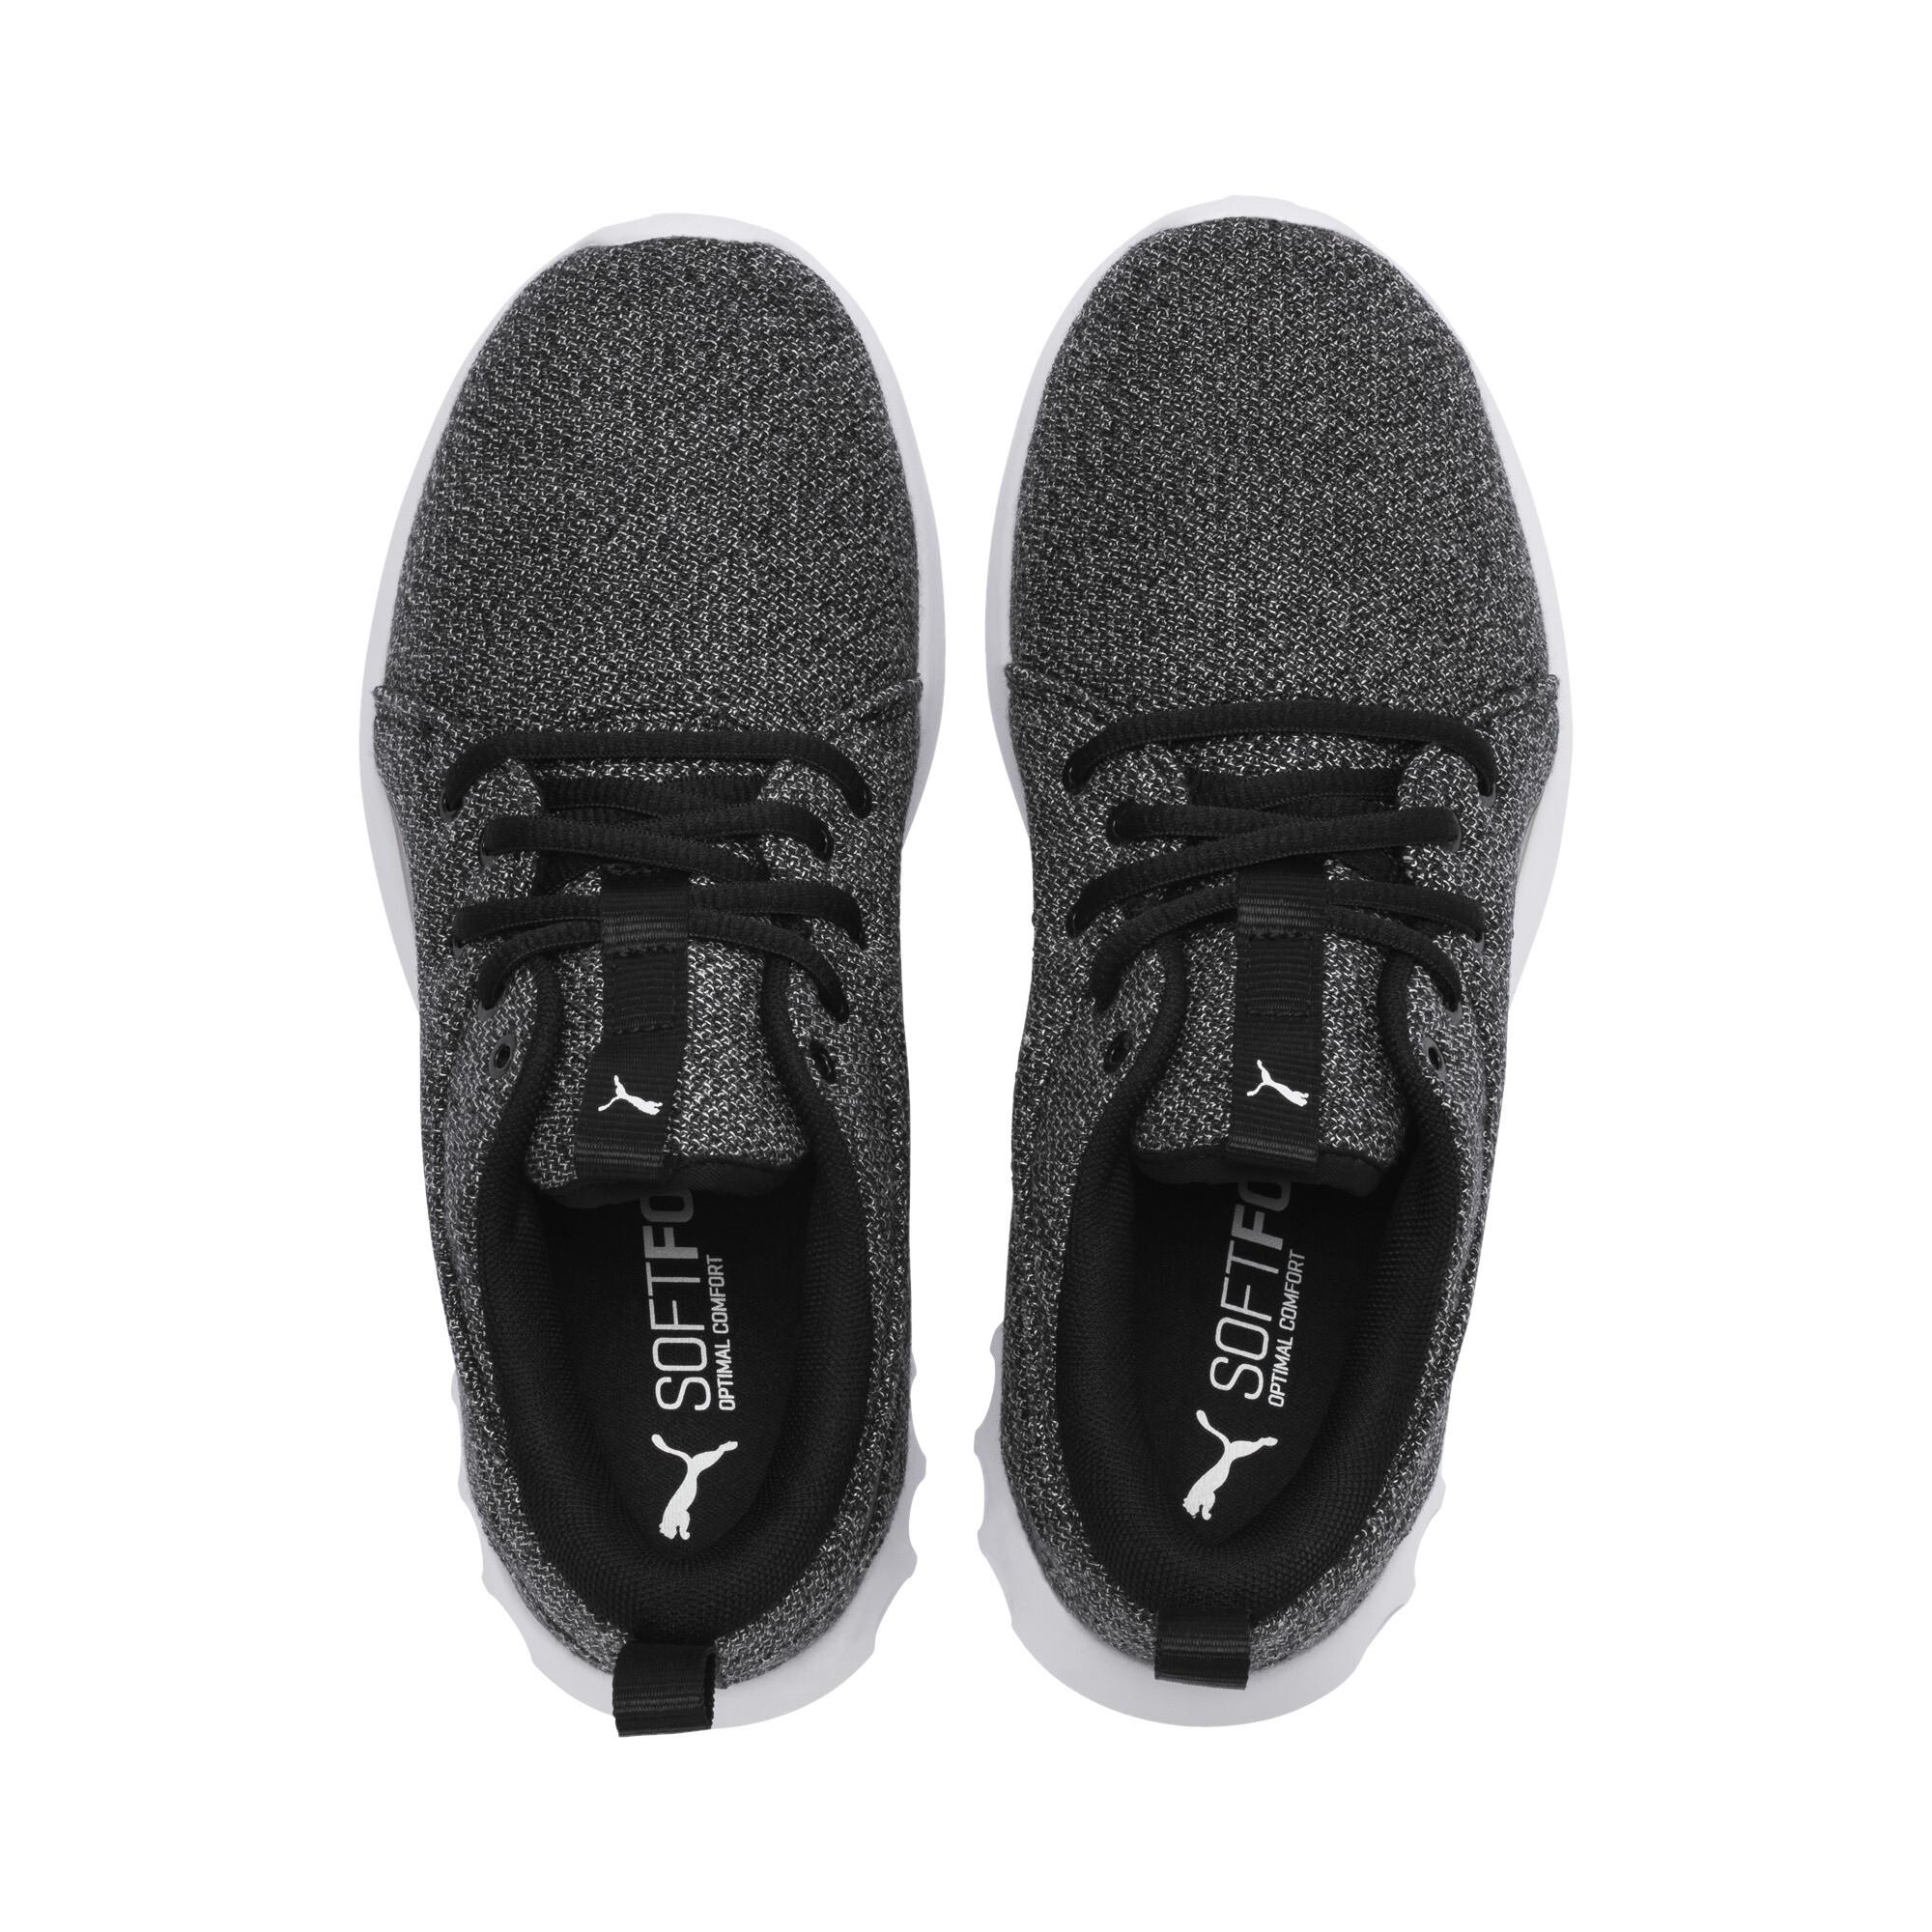 PUMA-Women-039-s-Carson-2-Knit-Running-Shoes thumbnail 26